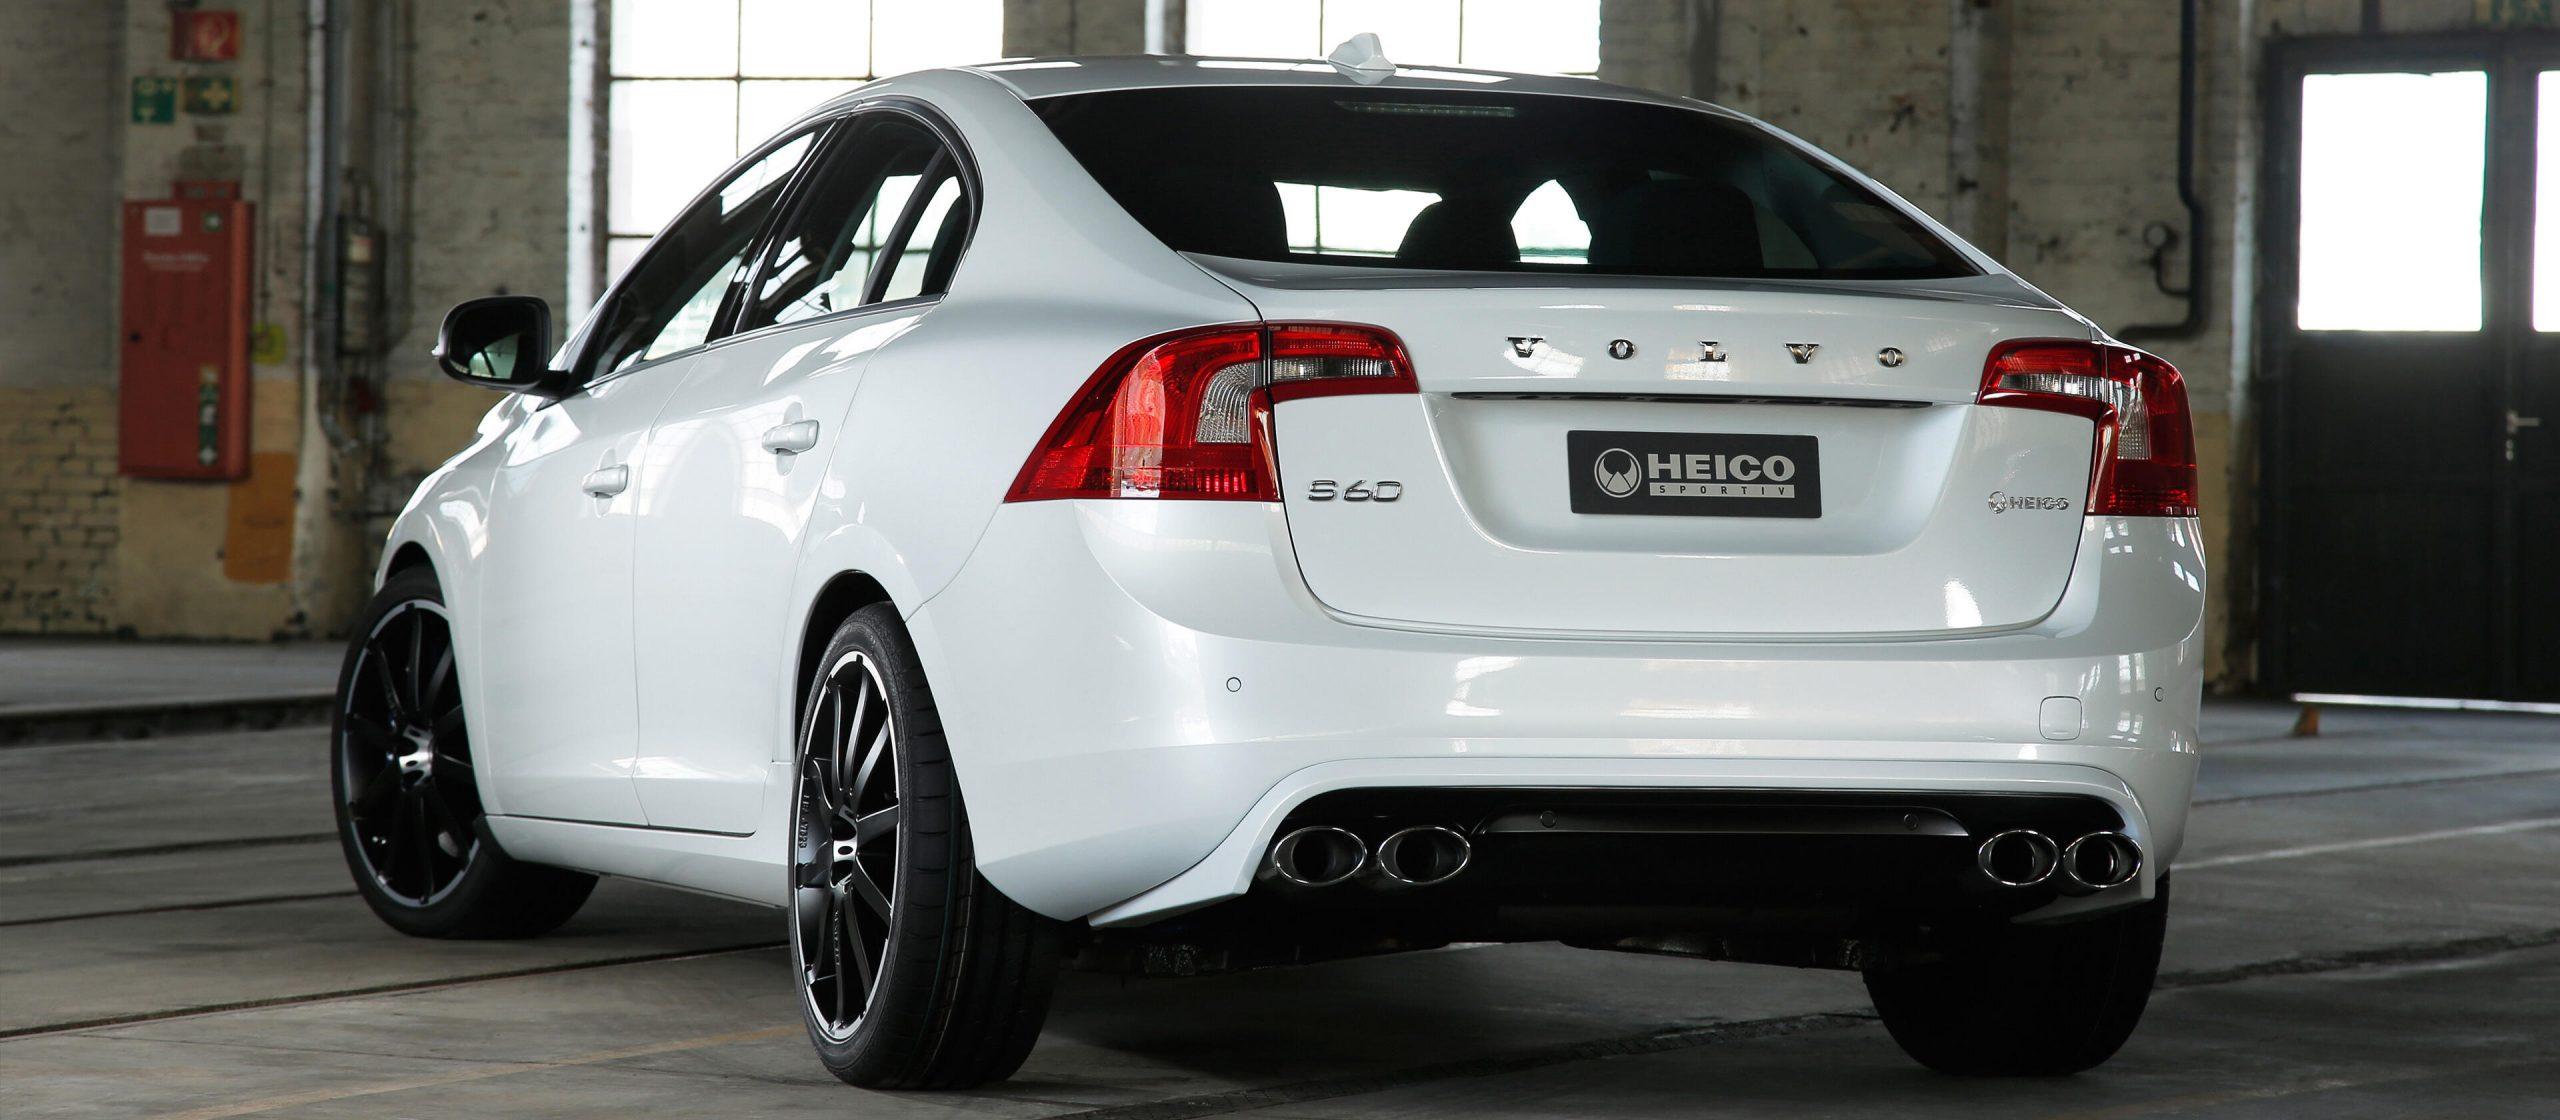 heico-sportiv-volvo-s60-134-rear-hero-slider-1